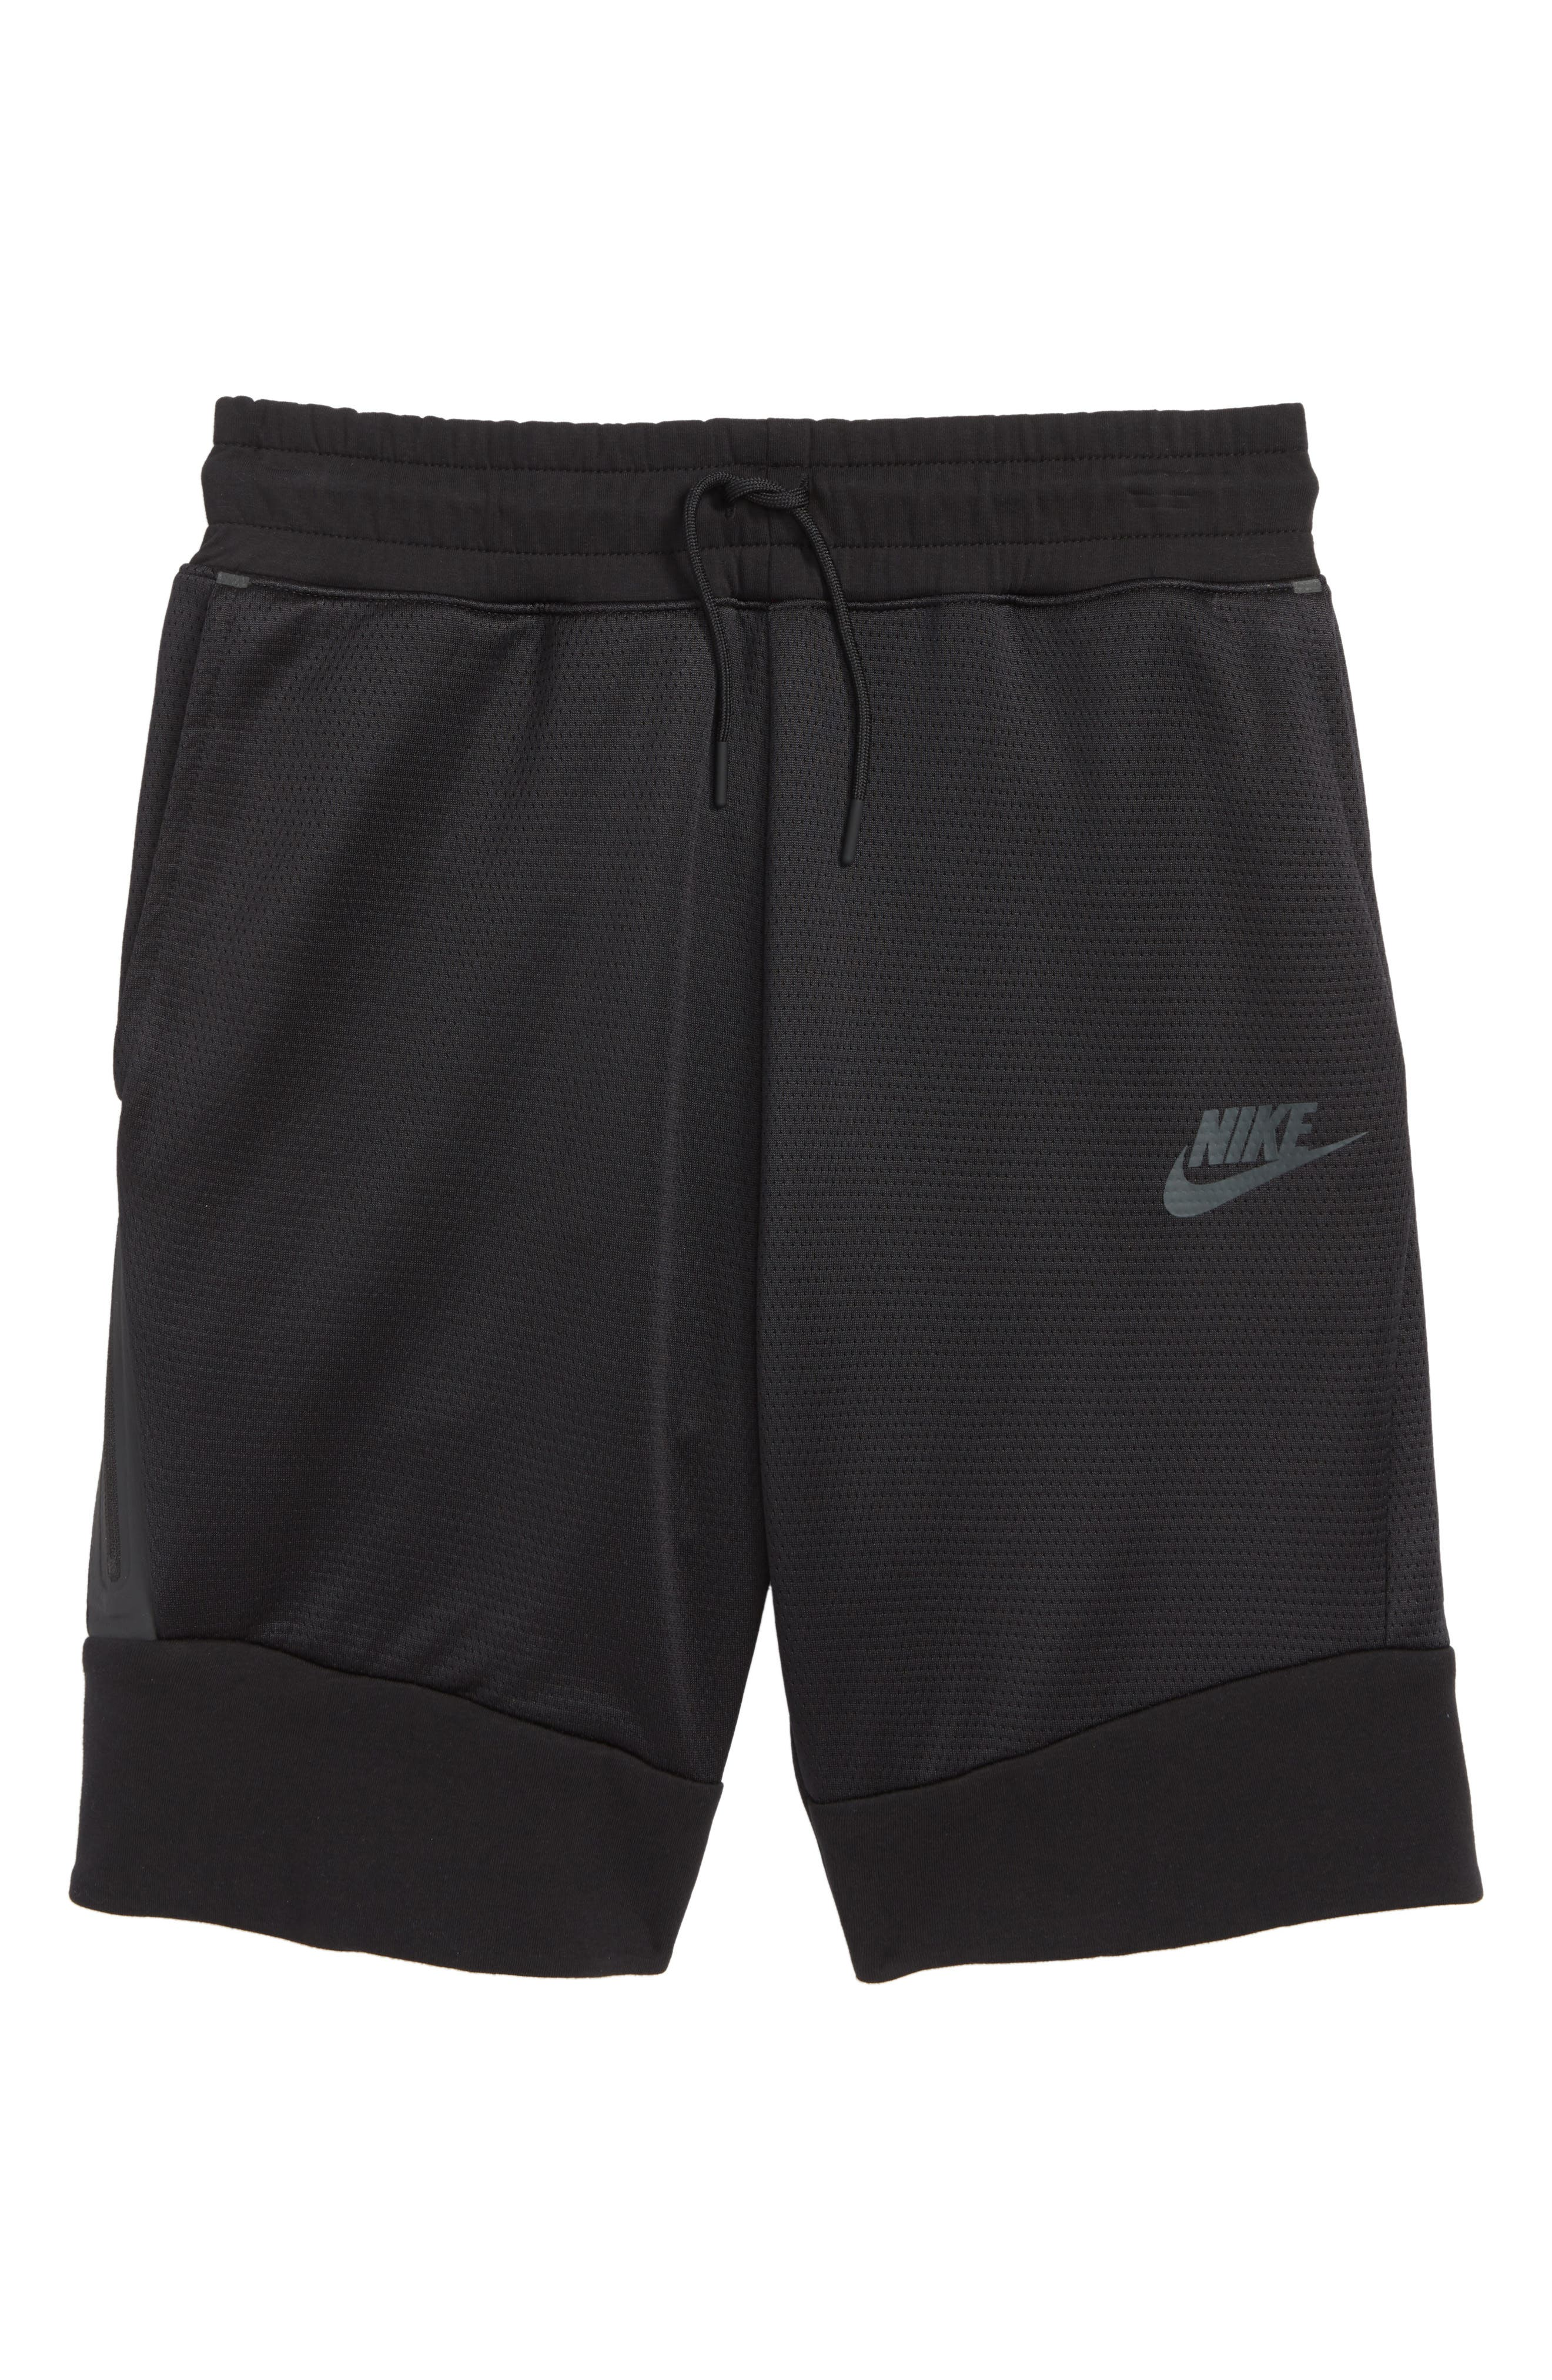 Sportswear Tech Fleece Shorts,                         Main,                         color, 010